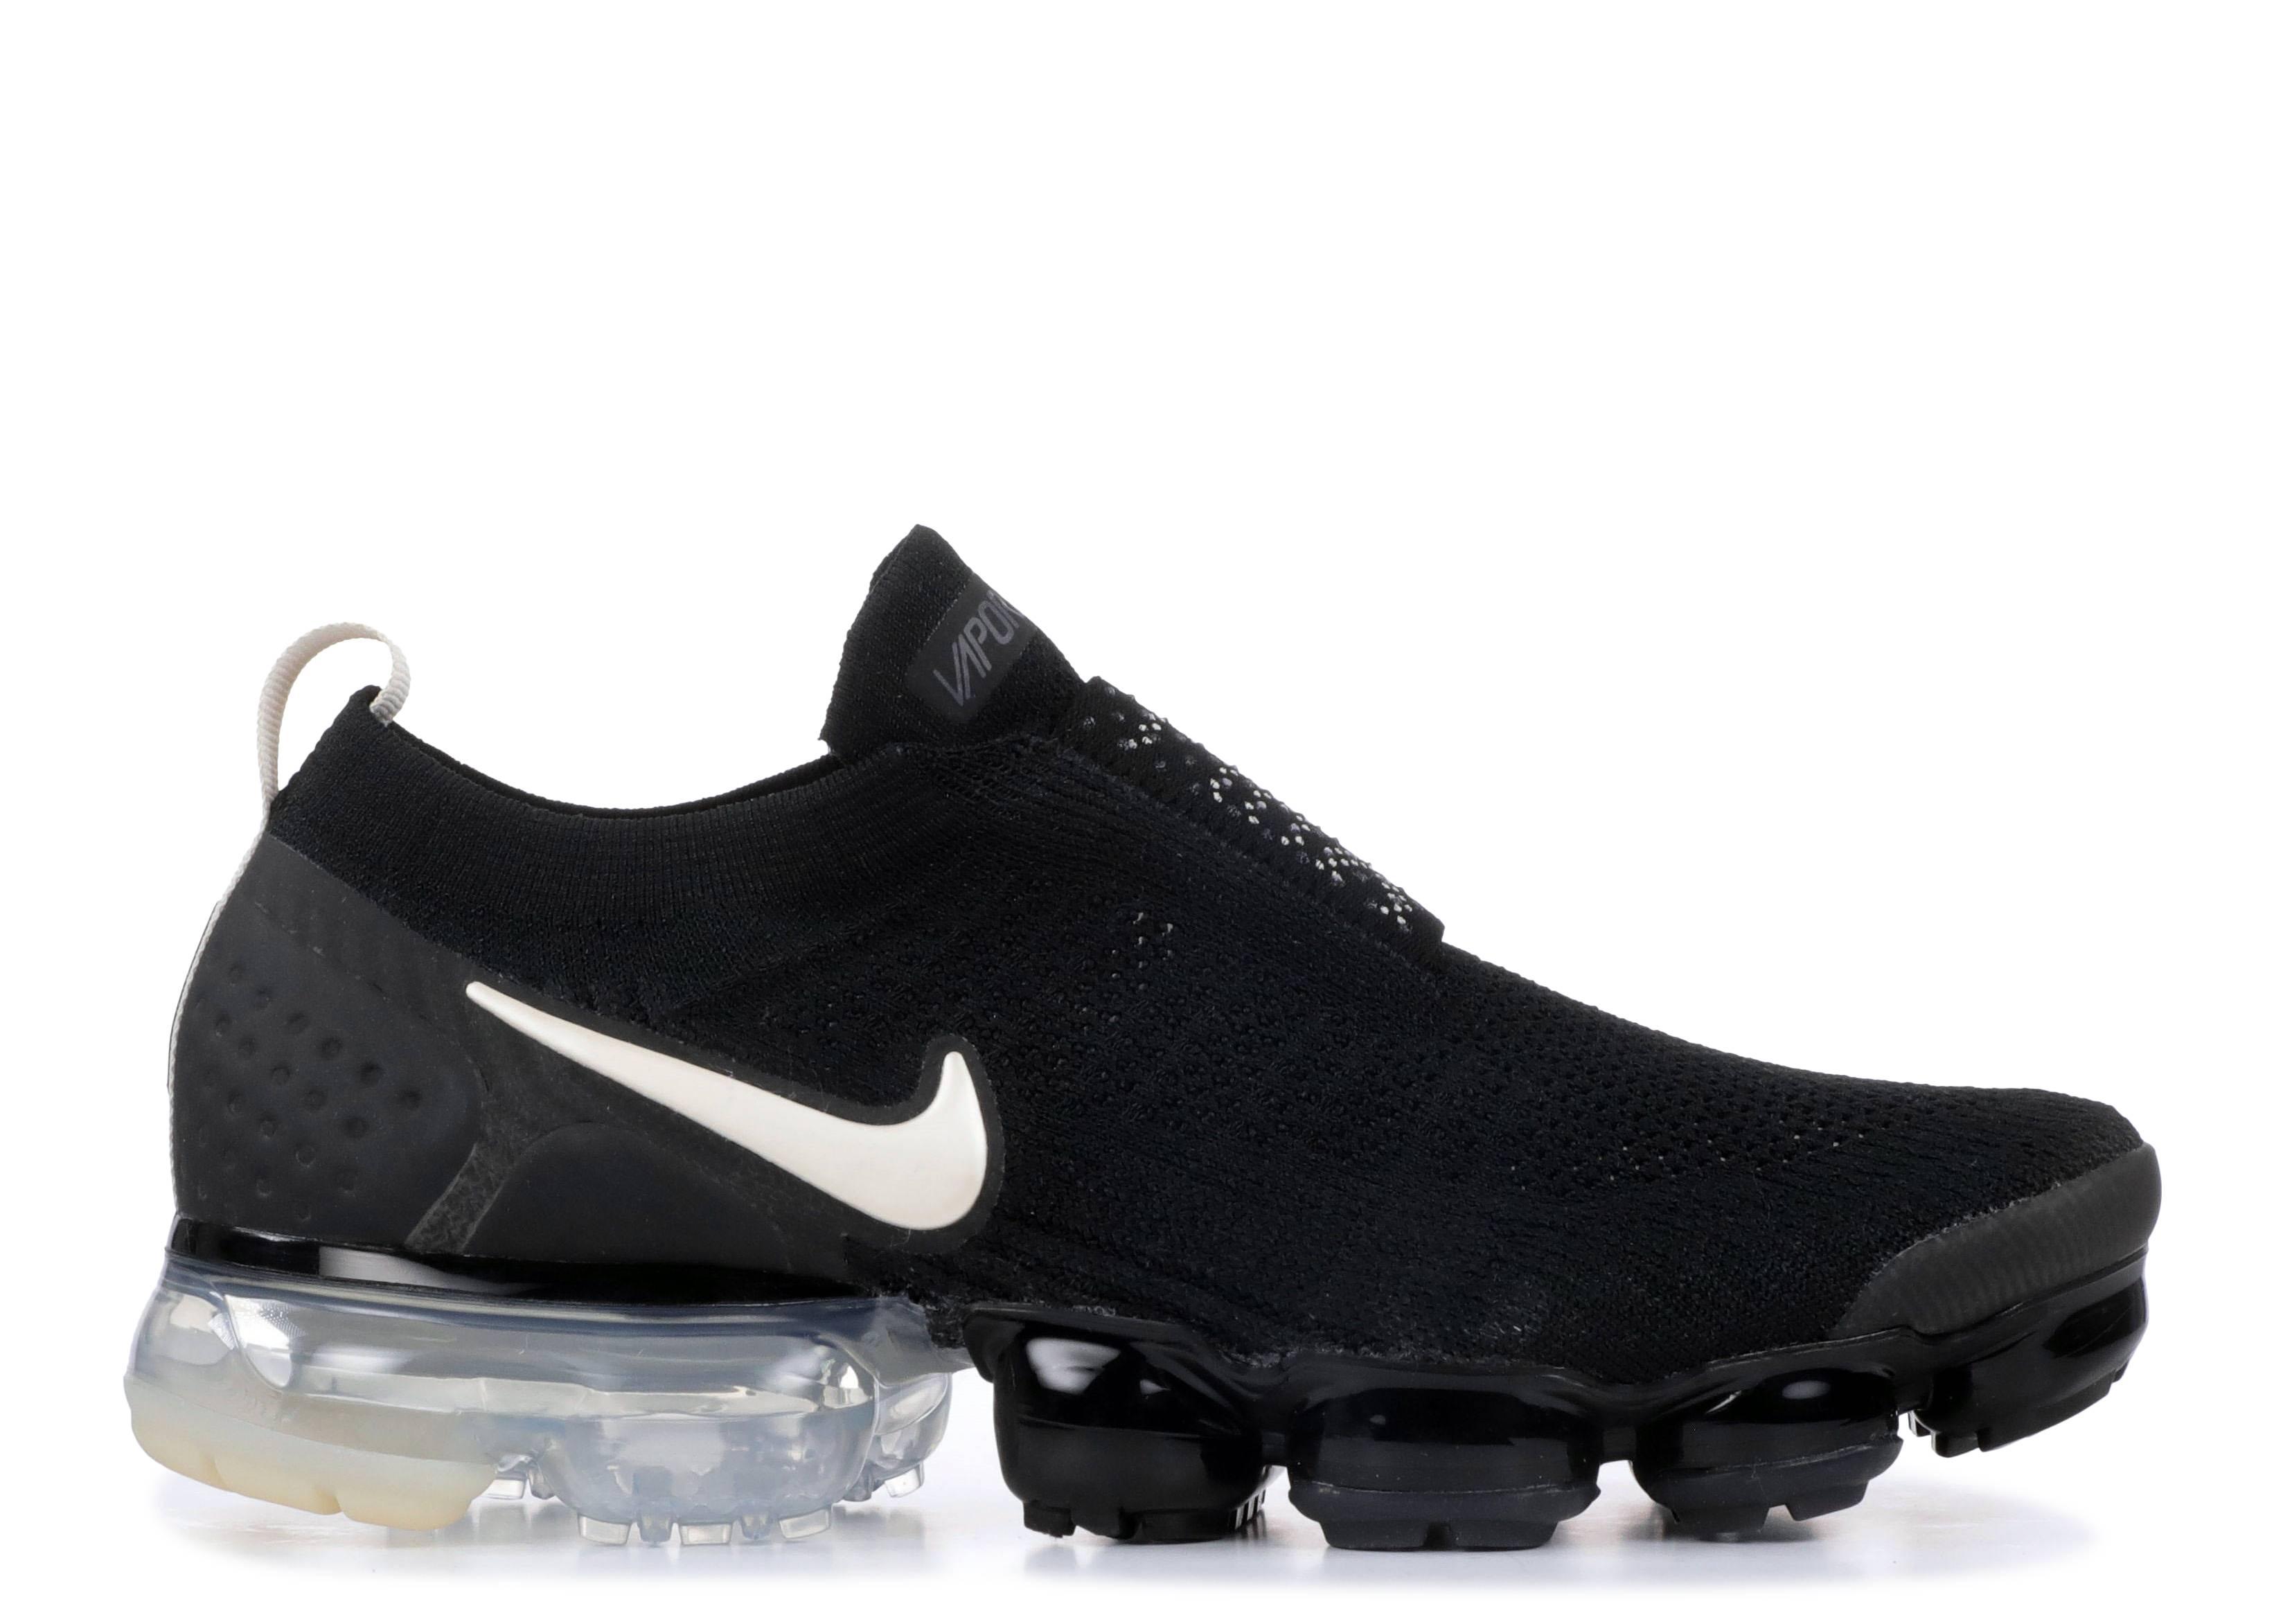 3f90569dd8 Nike Vapormax FK Moc 2 - Nike - AH7006-002 - black/lt cream-white ...